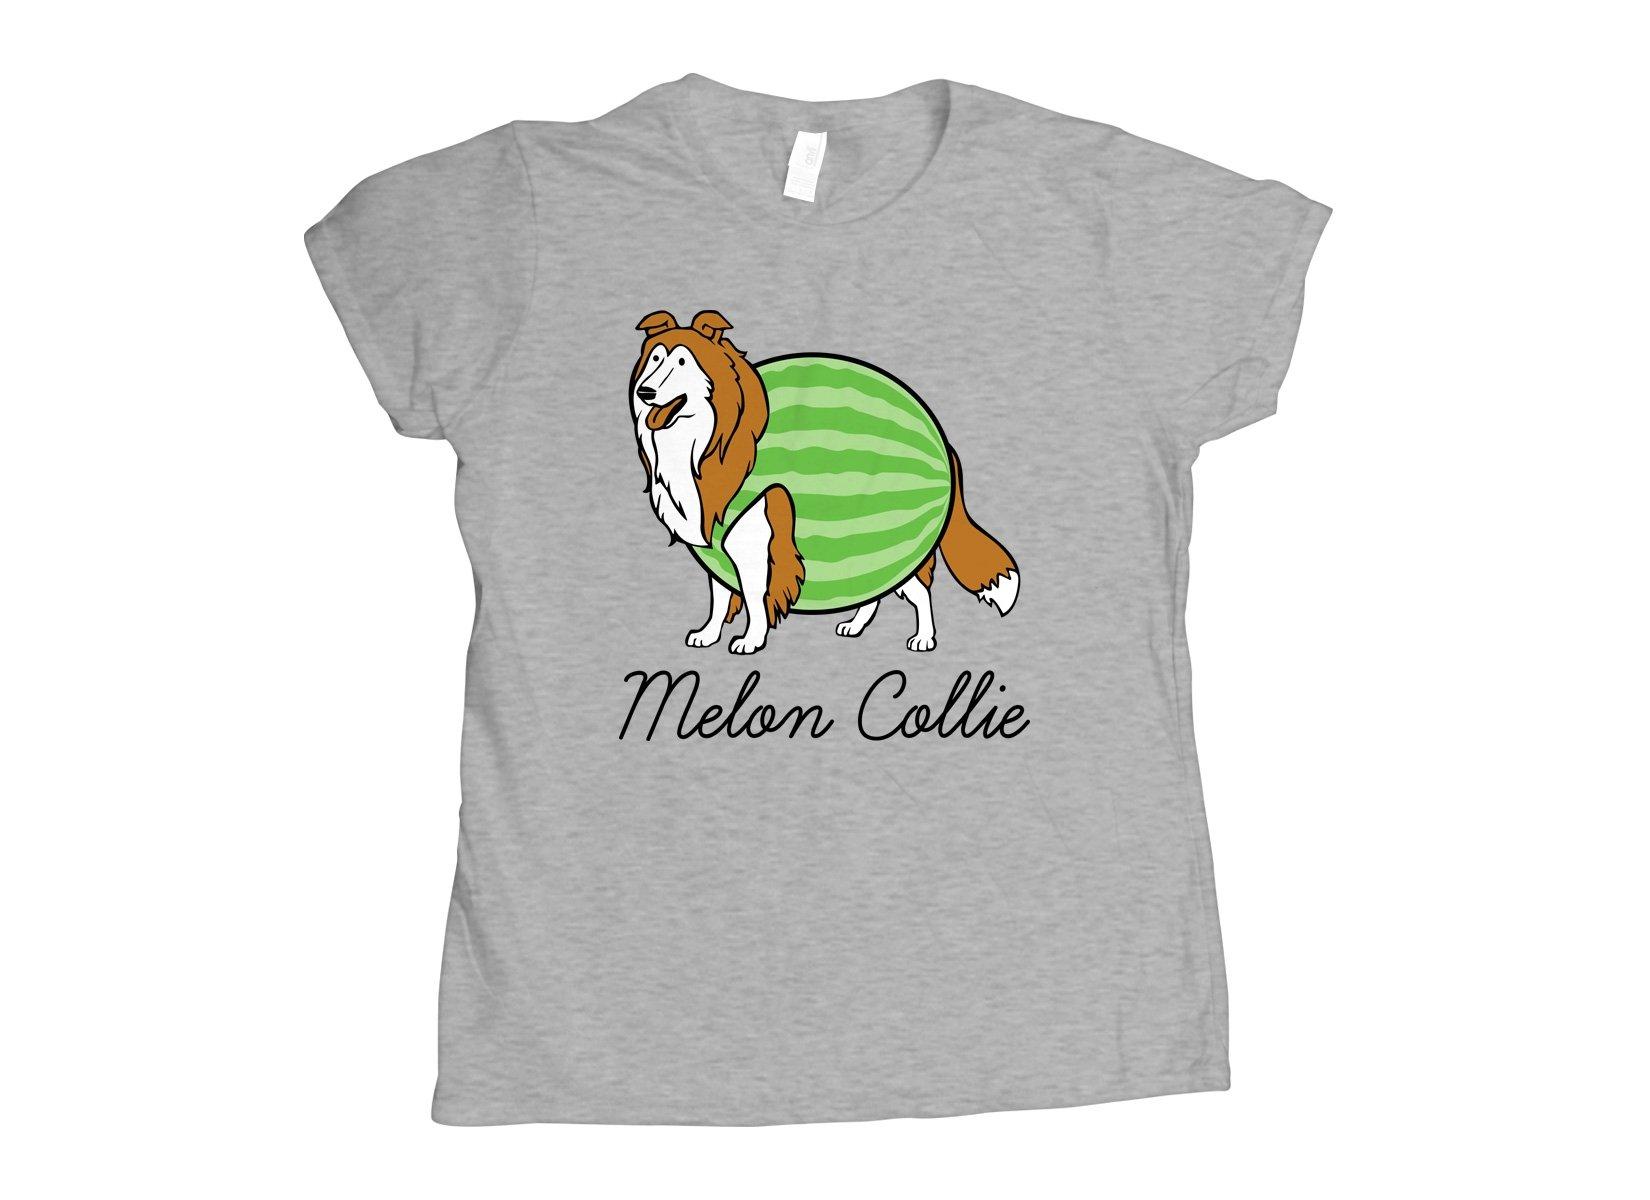 Melon Collie on Womens T-Shirt